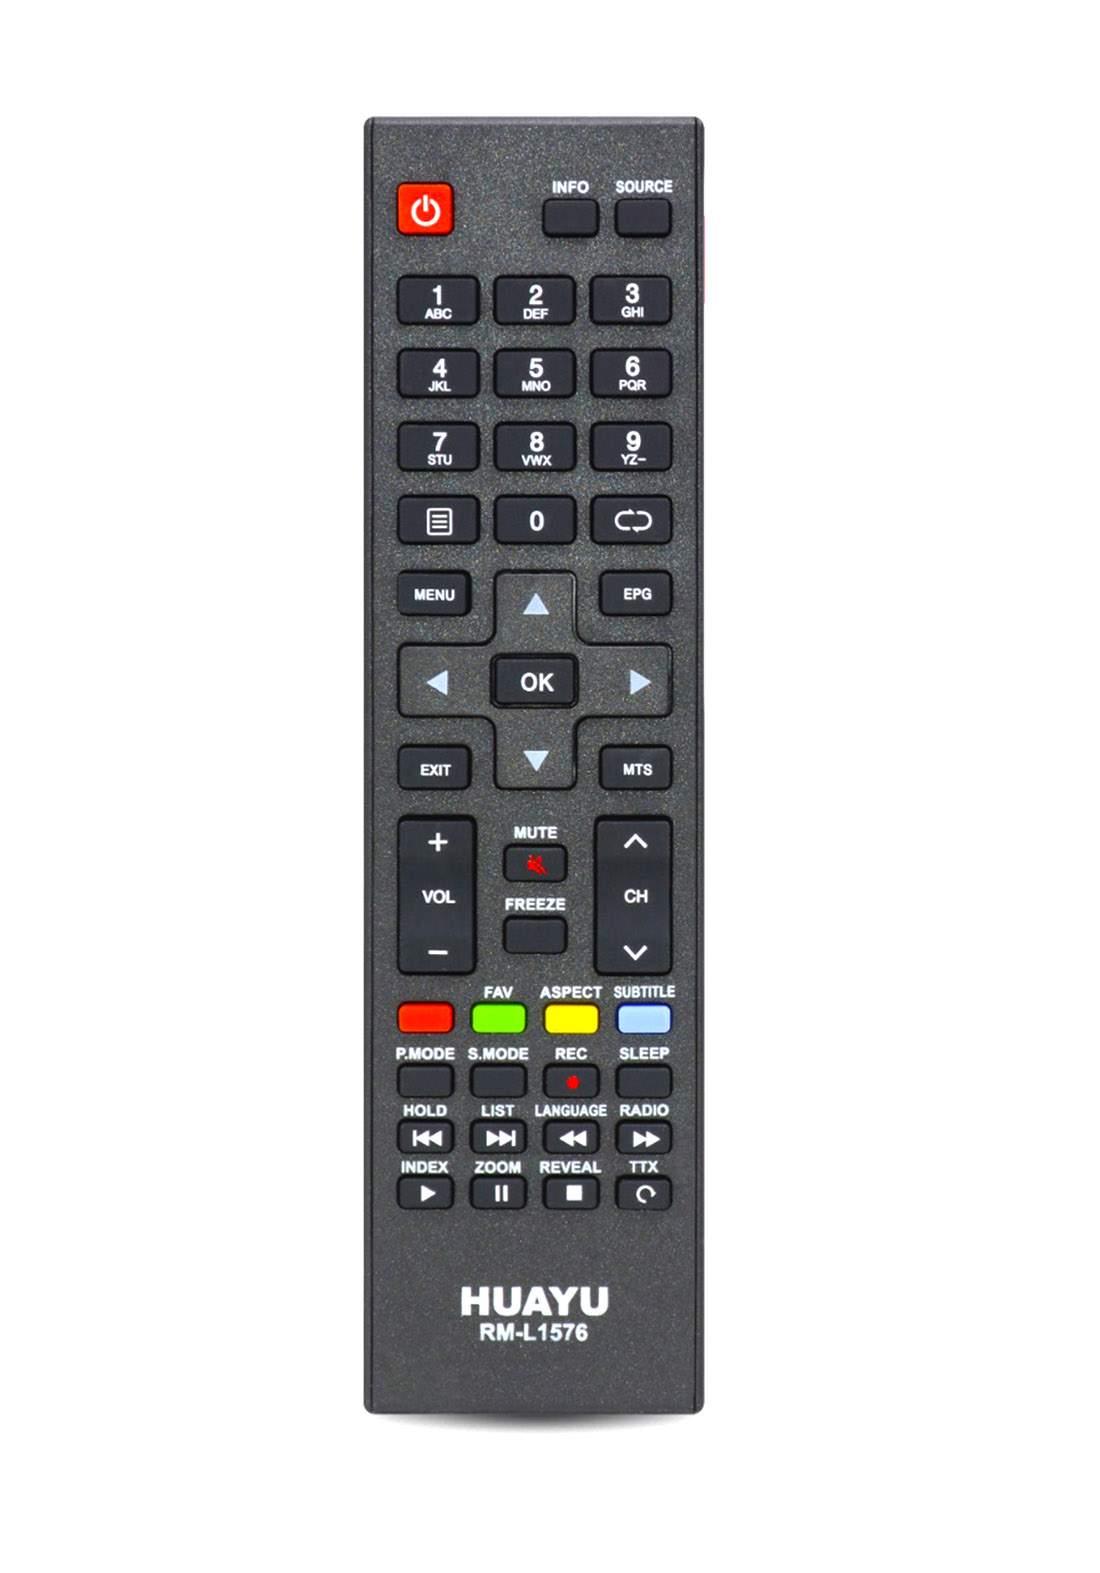 HUAYU Remote Control For Daewoo TV  - Black جهاز التحكم عن بعد